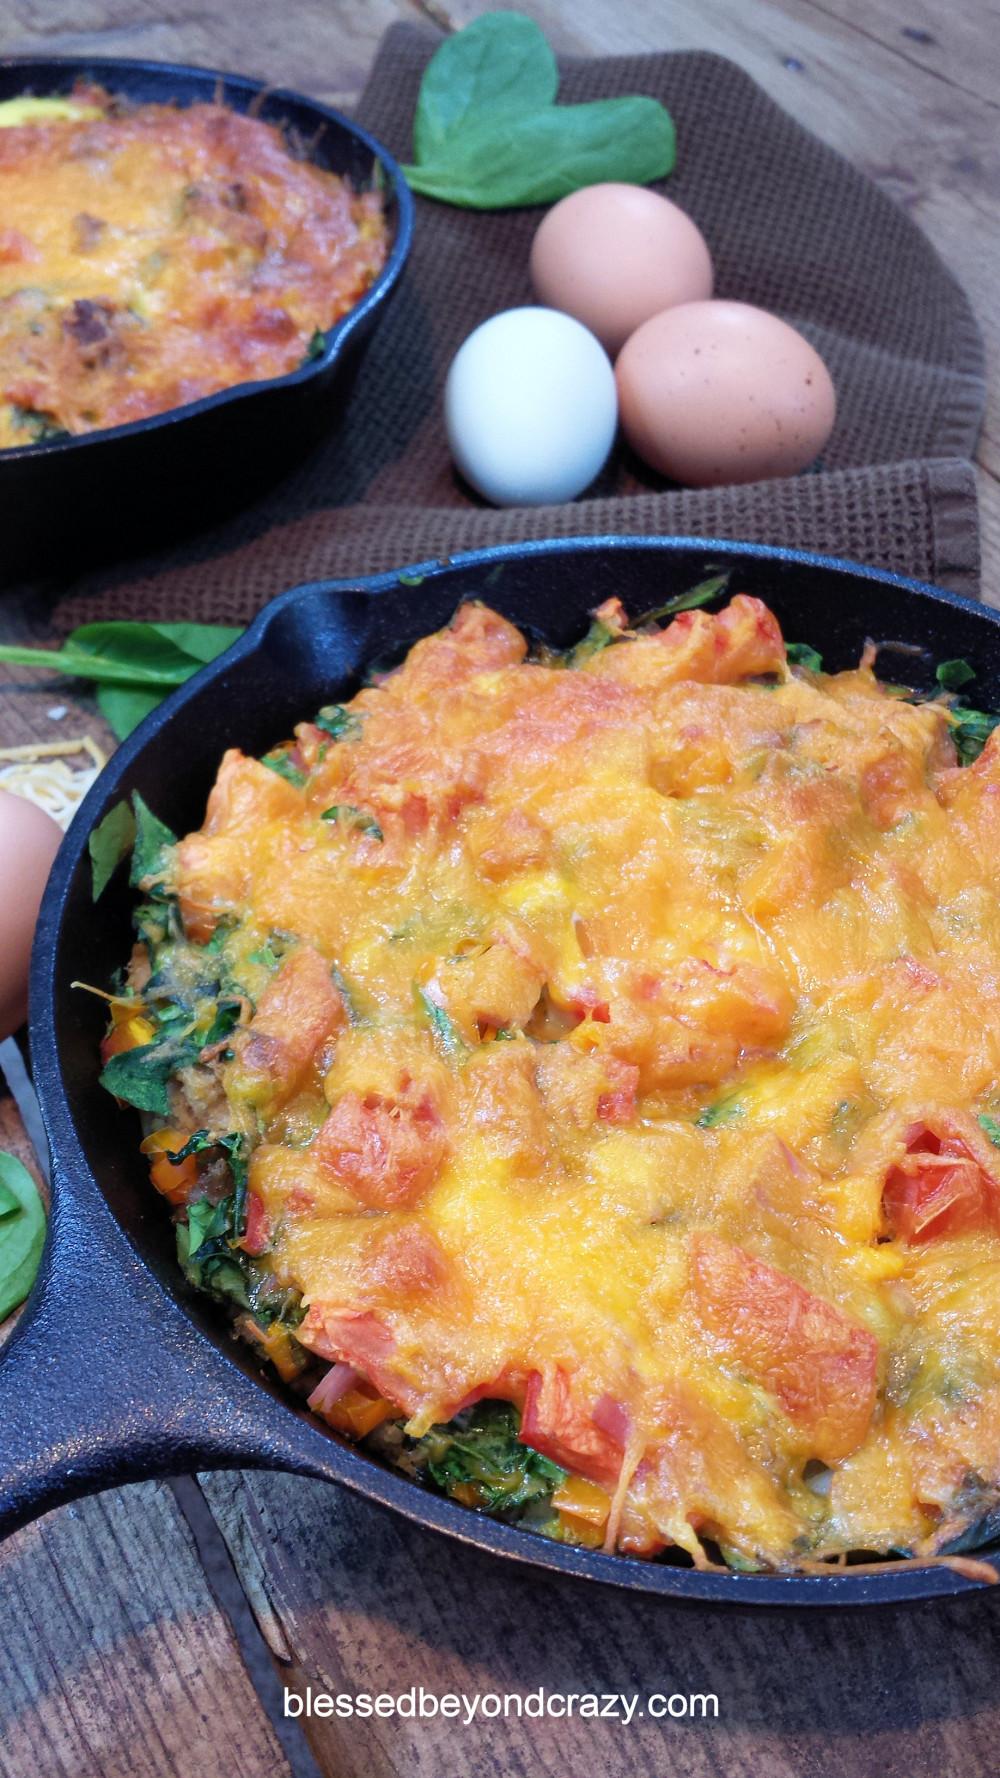 Breakfast Skillets 10